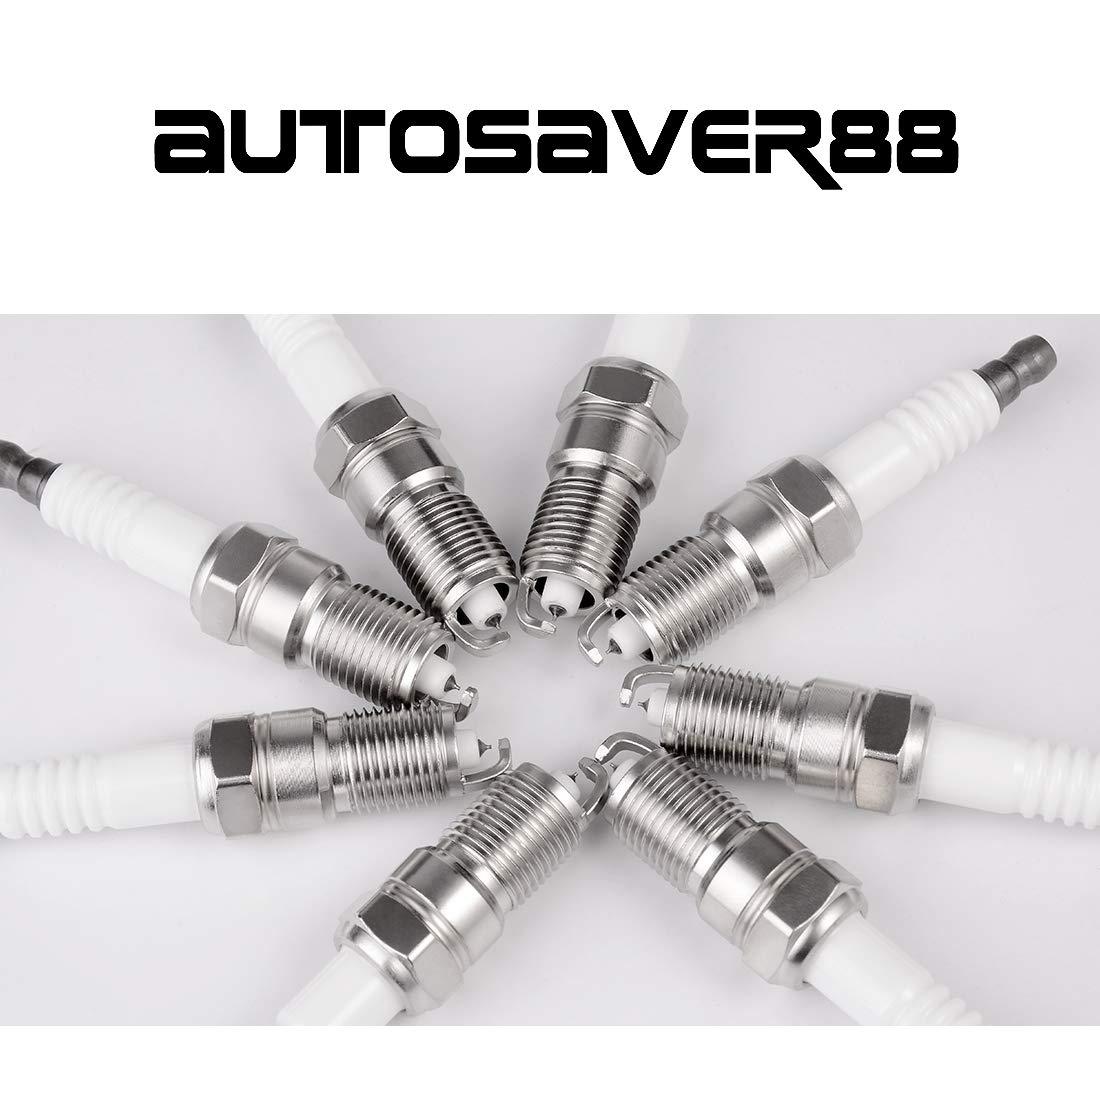 Amazon.com: Pack of 8 Iridium Spark Plugs for Buick Cadillac Chevy Ford GMC Hummer Mazda Mercury Pontiac: Automotive